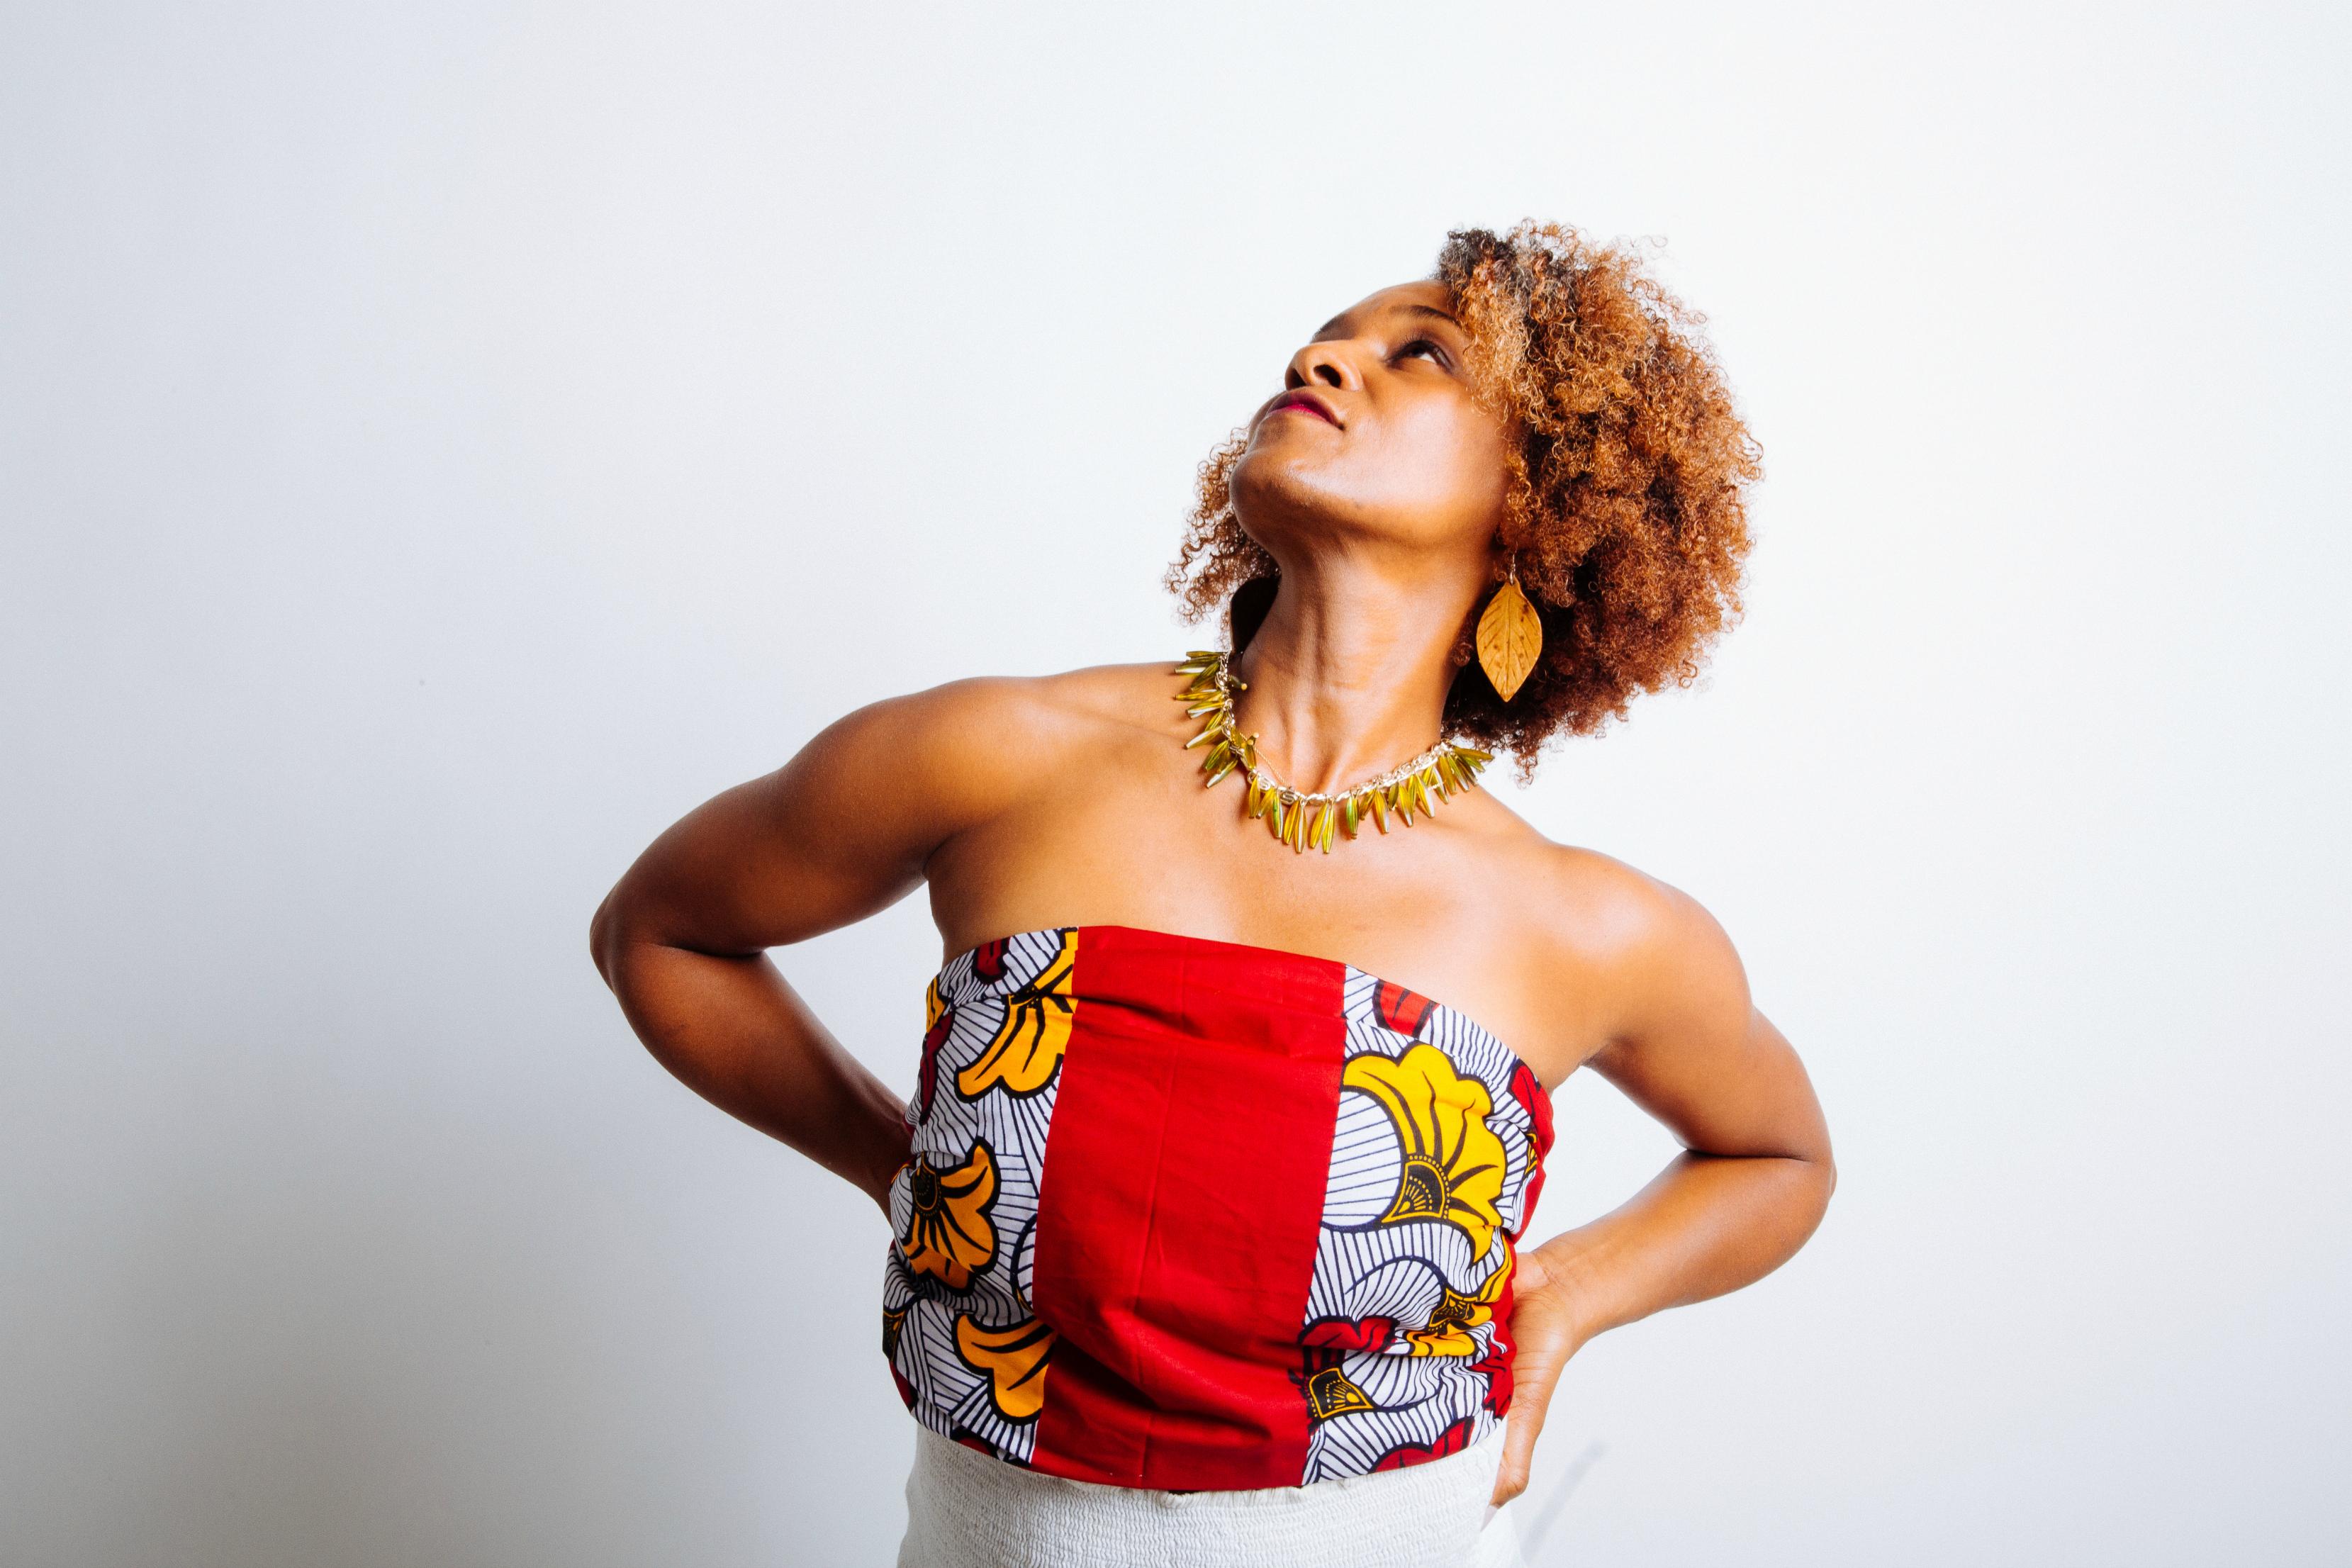 Michelle-Grant-Murray the black artist talk